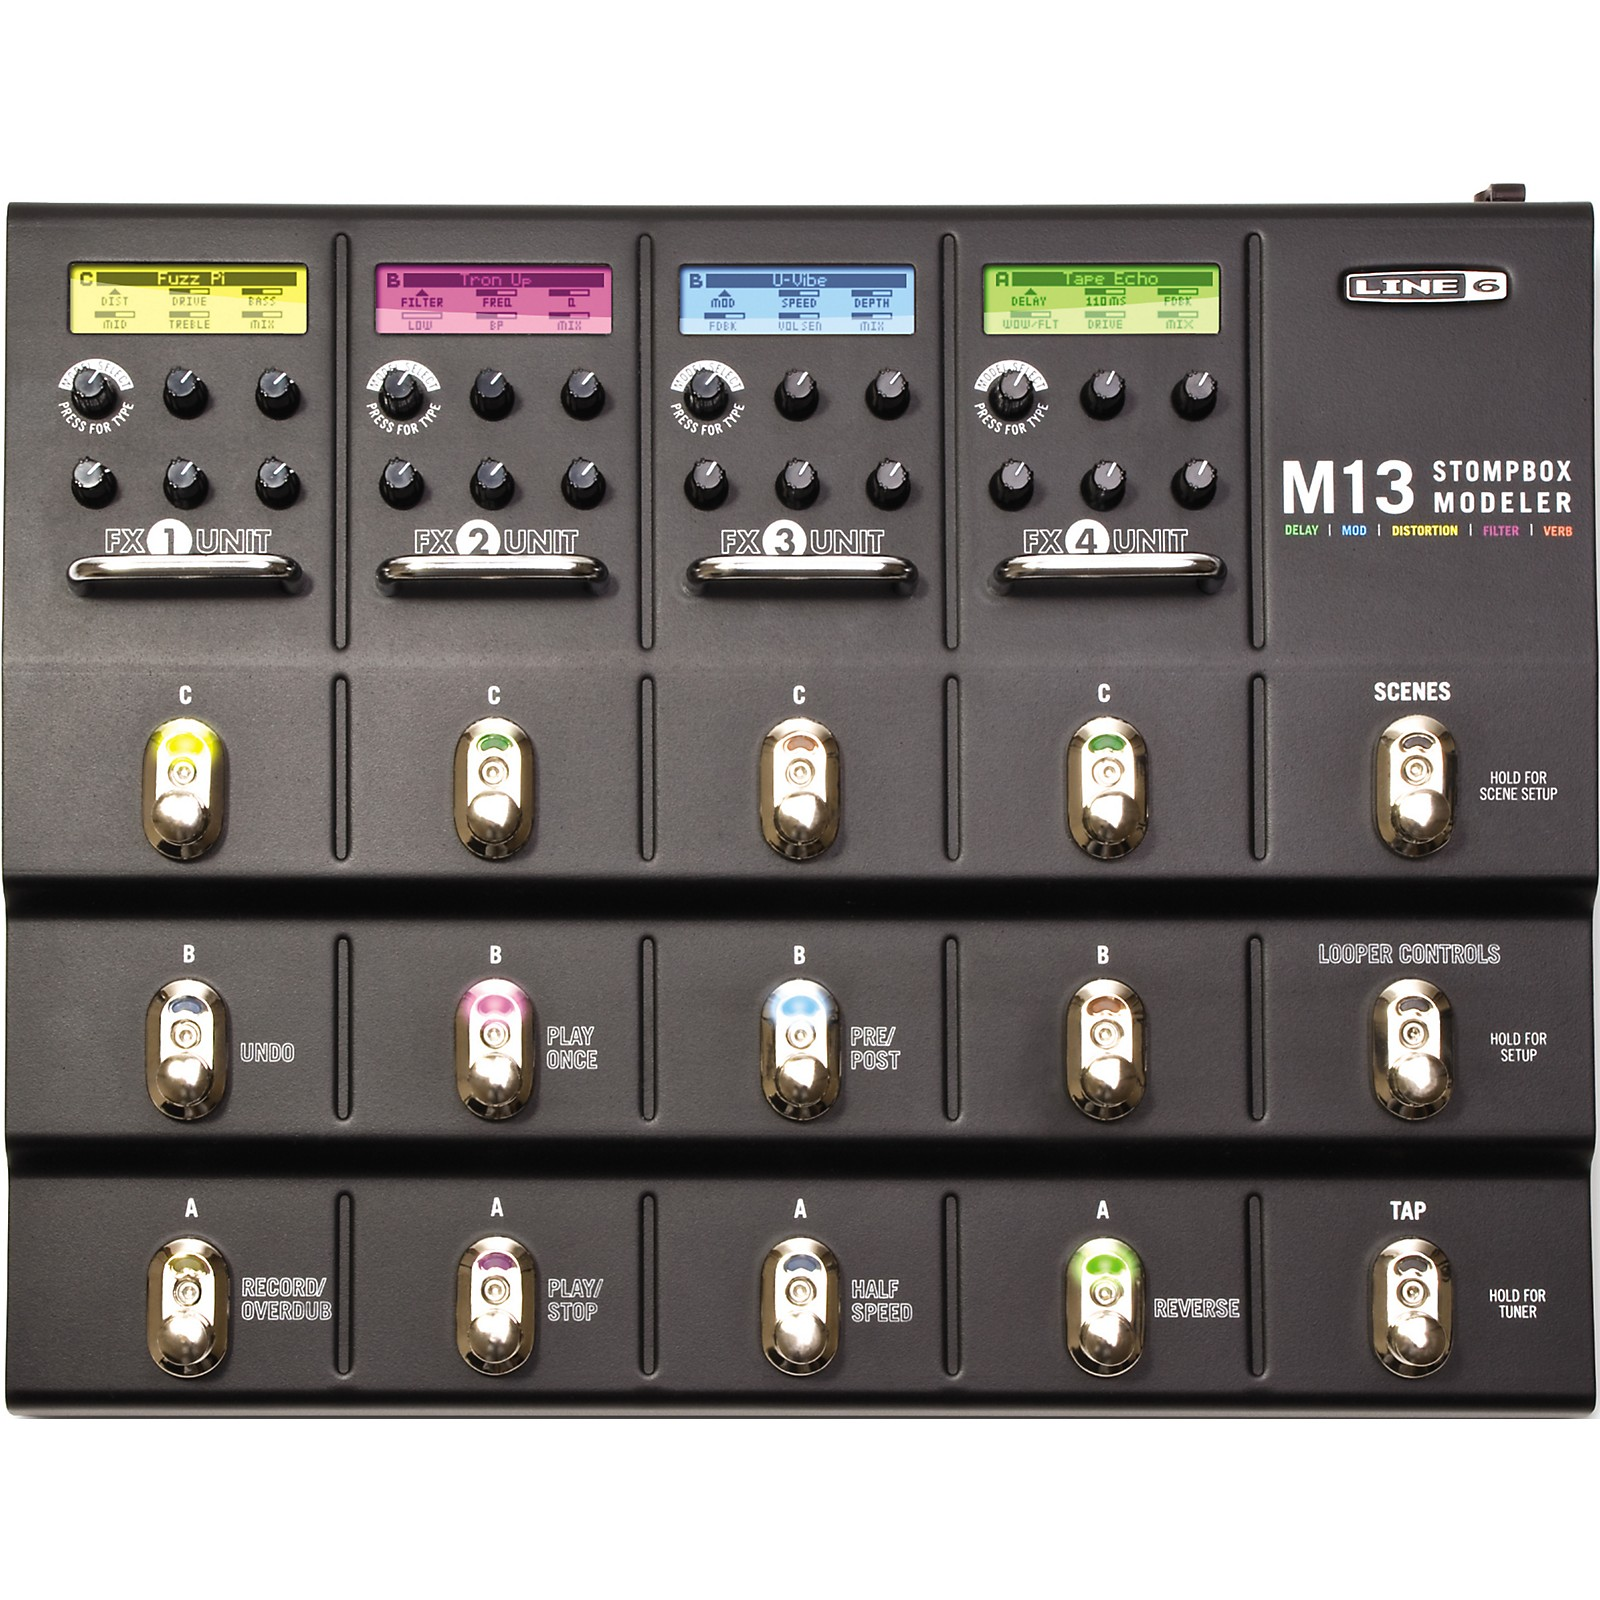 Line 6 M13 Stompbox Modeler Guitar Multi-Effects Pedal